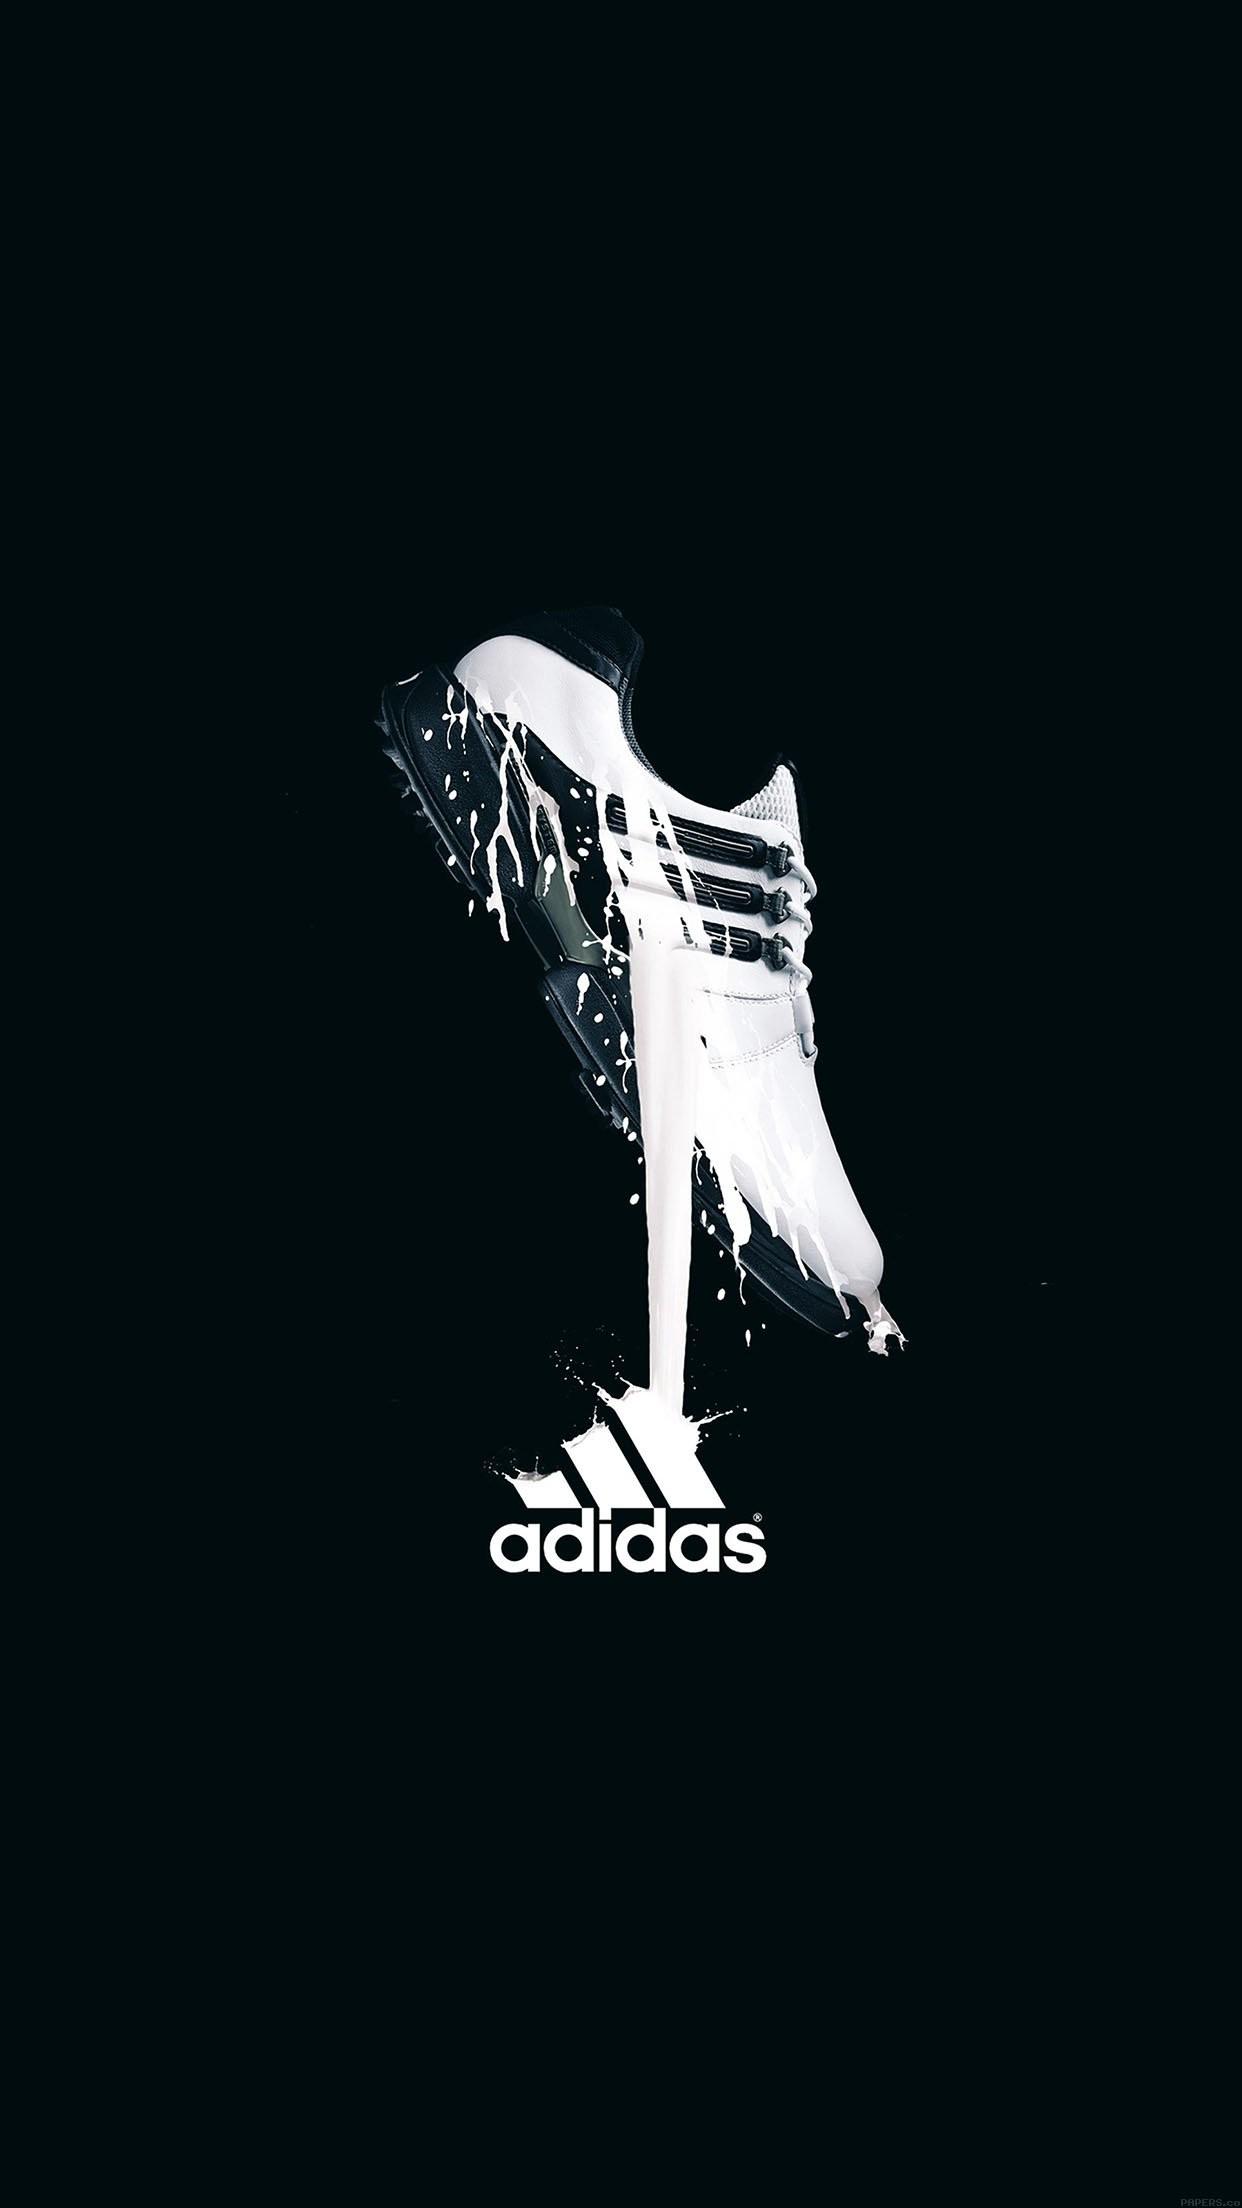 1920x1080 1920x1080 Adidas Logo Wallpapers 2015 | amxxcs.ru · Download